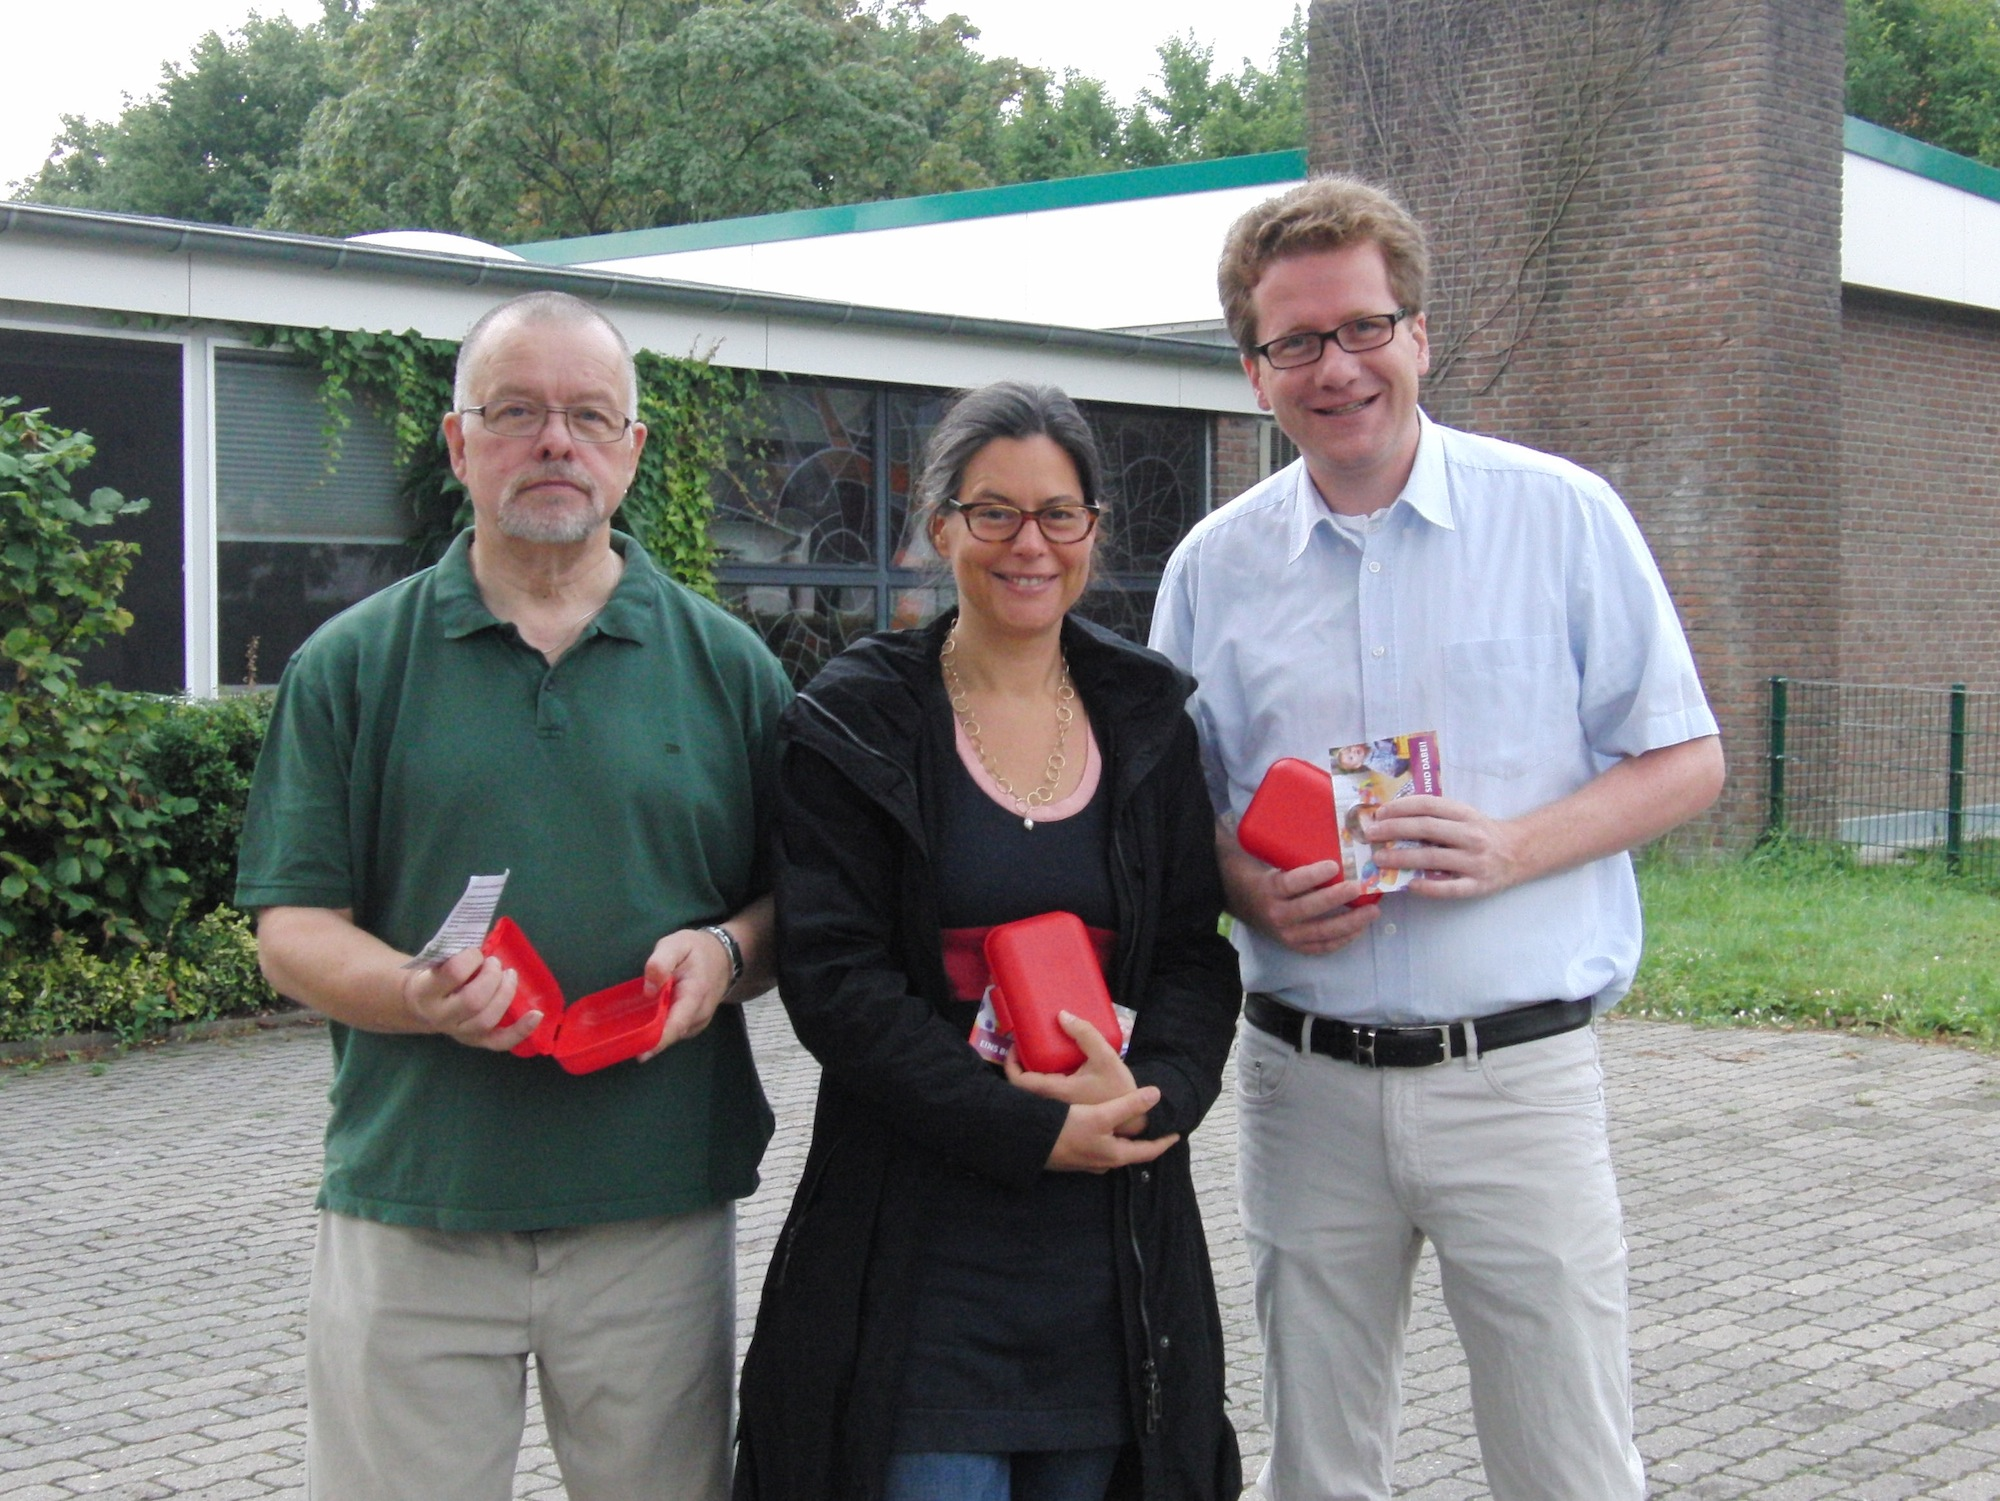 v.l.n.r.: Heinrich Dippel, Nina Scheer, Martin Habersaat